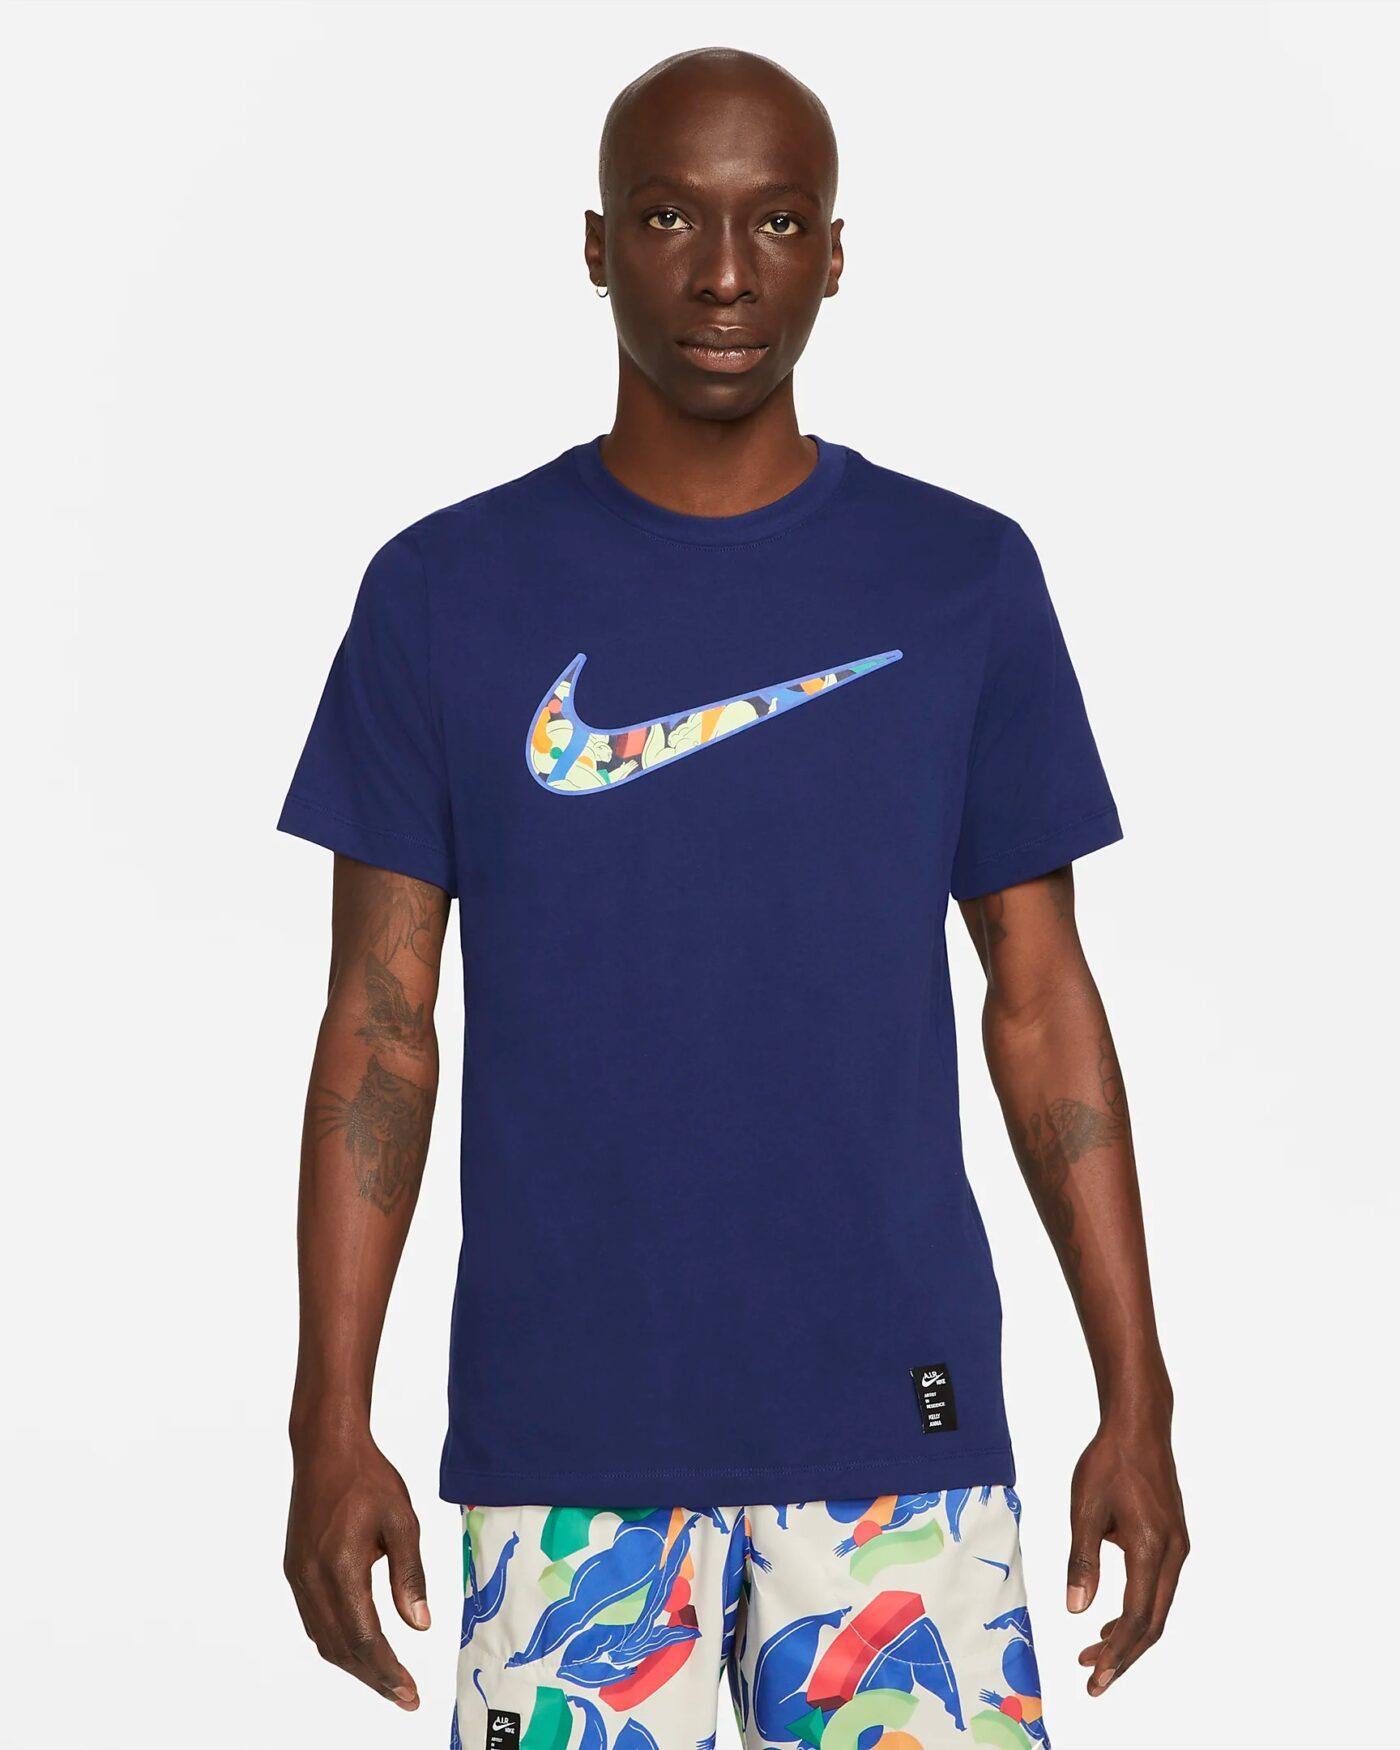 Collection AIR Nike Kelly Anna London T Shirt